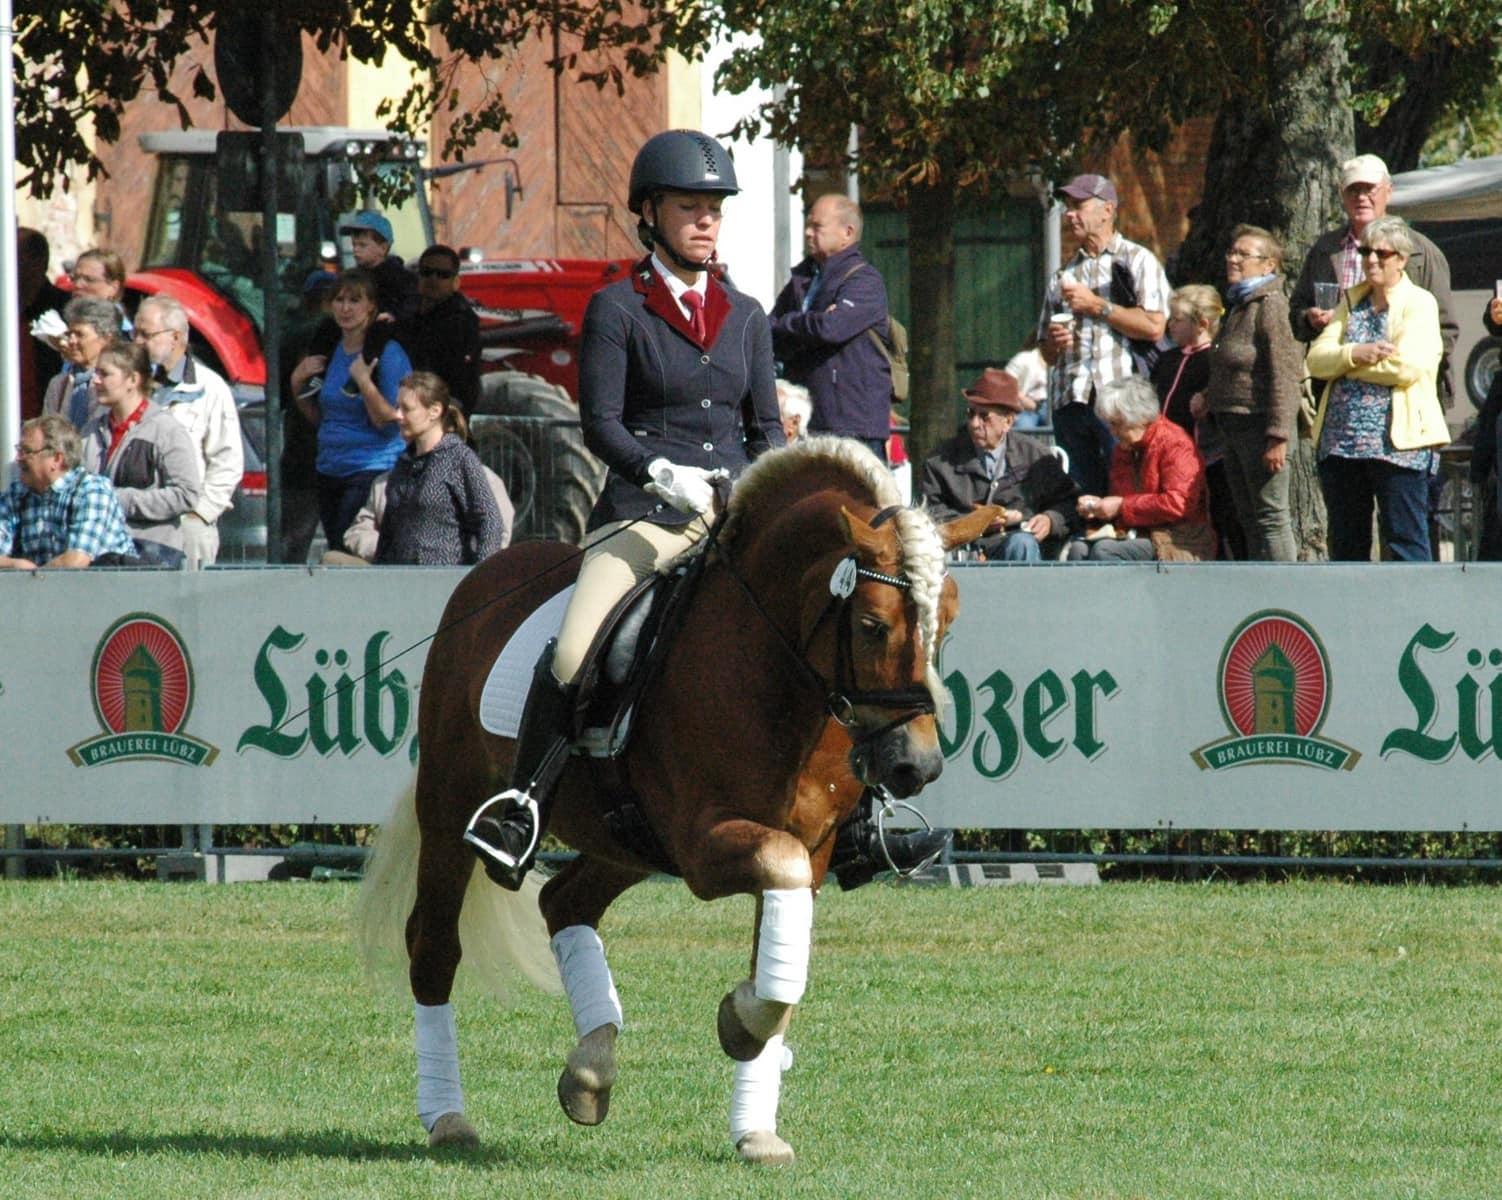 Championats Pferd Amore Mio, GOW Friedsricke Maas (2)